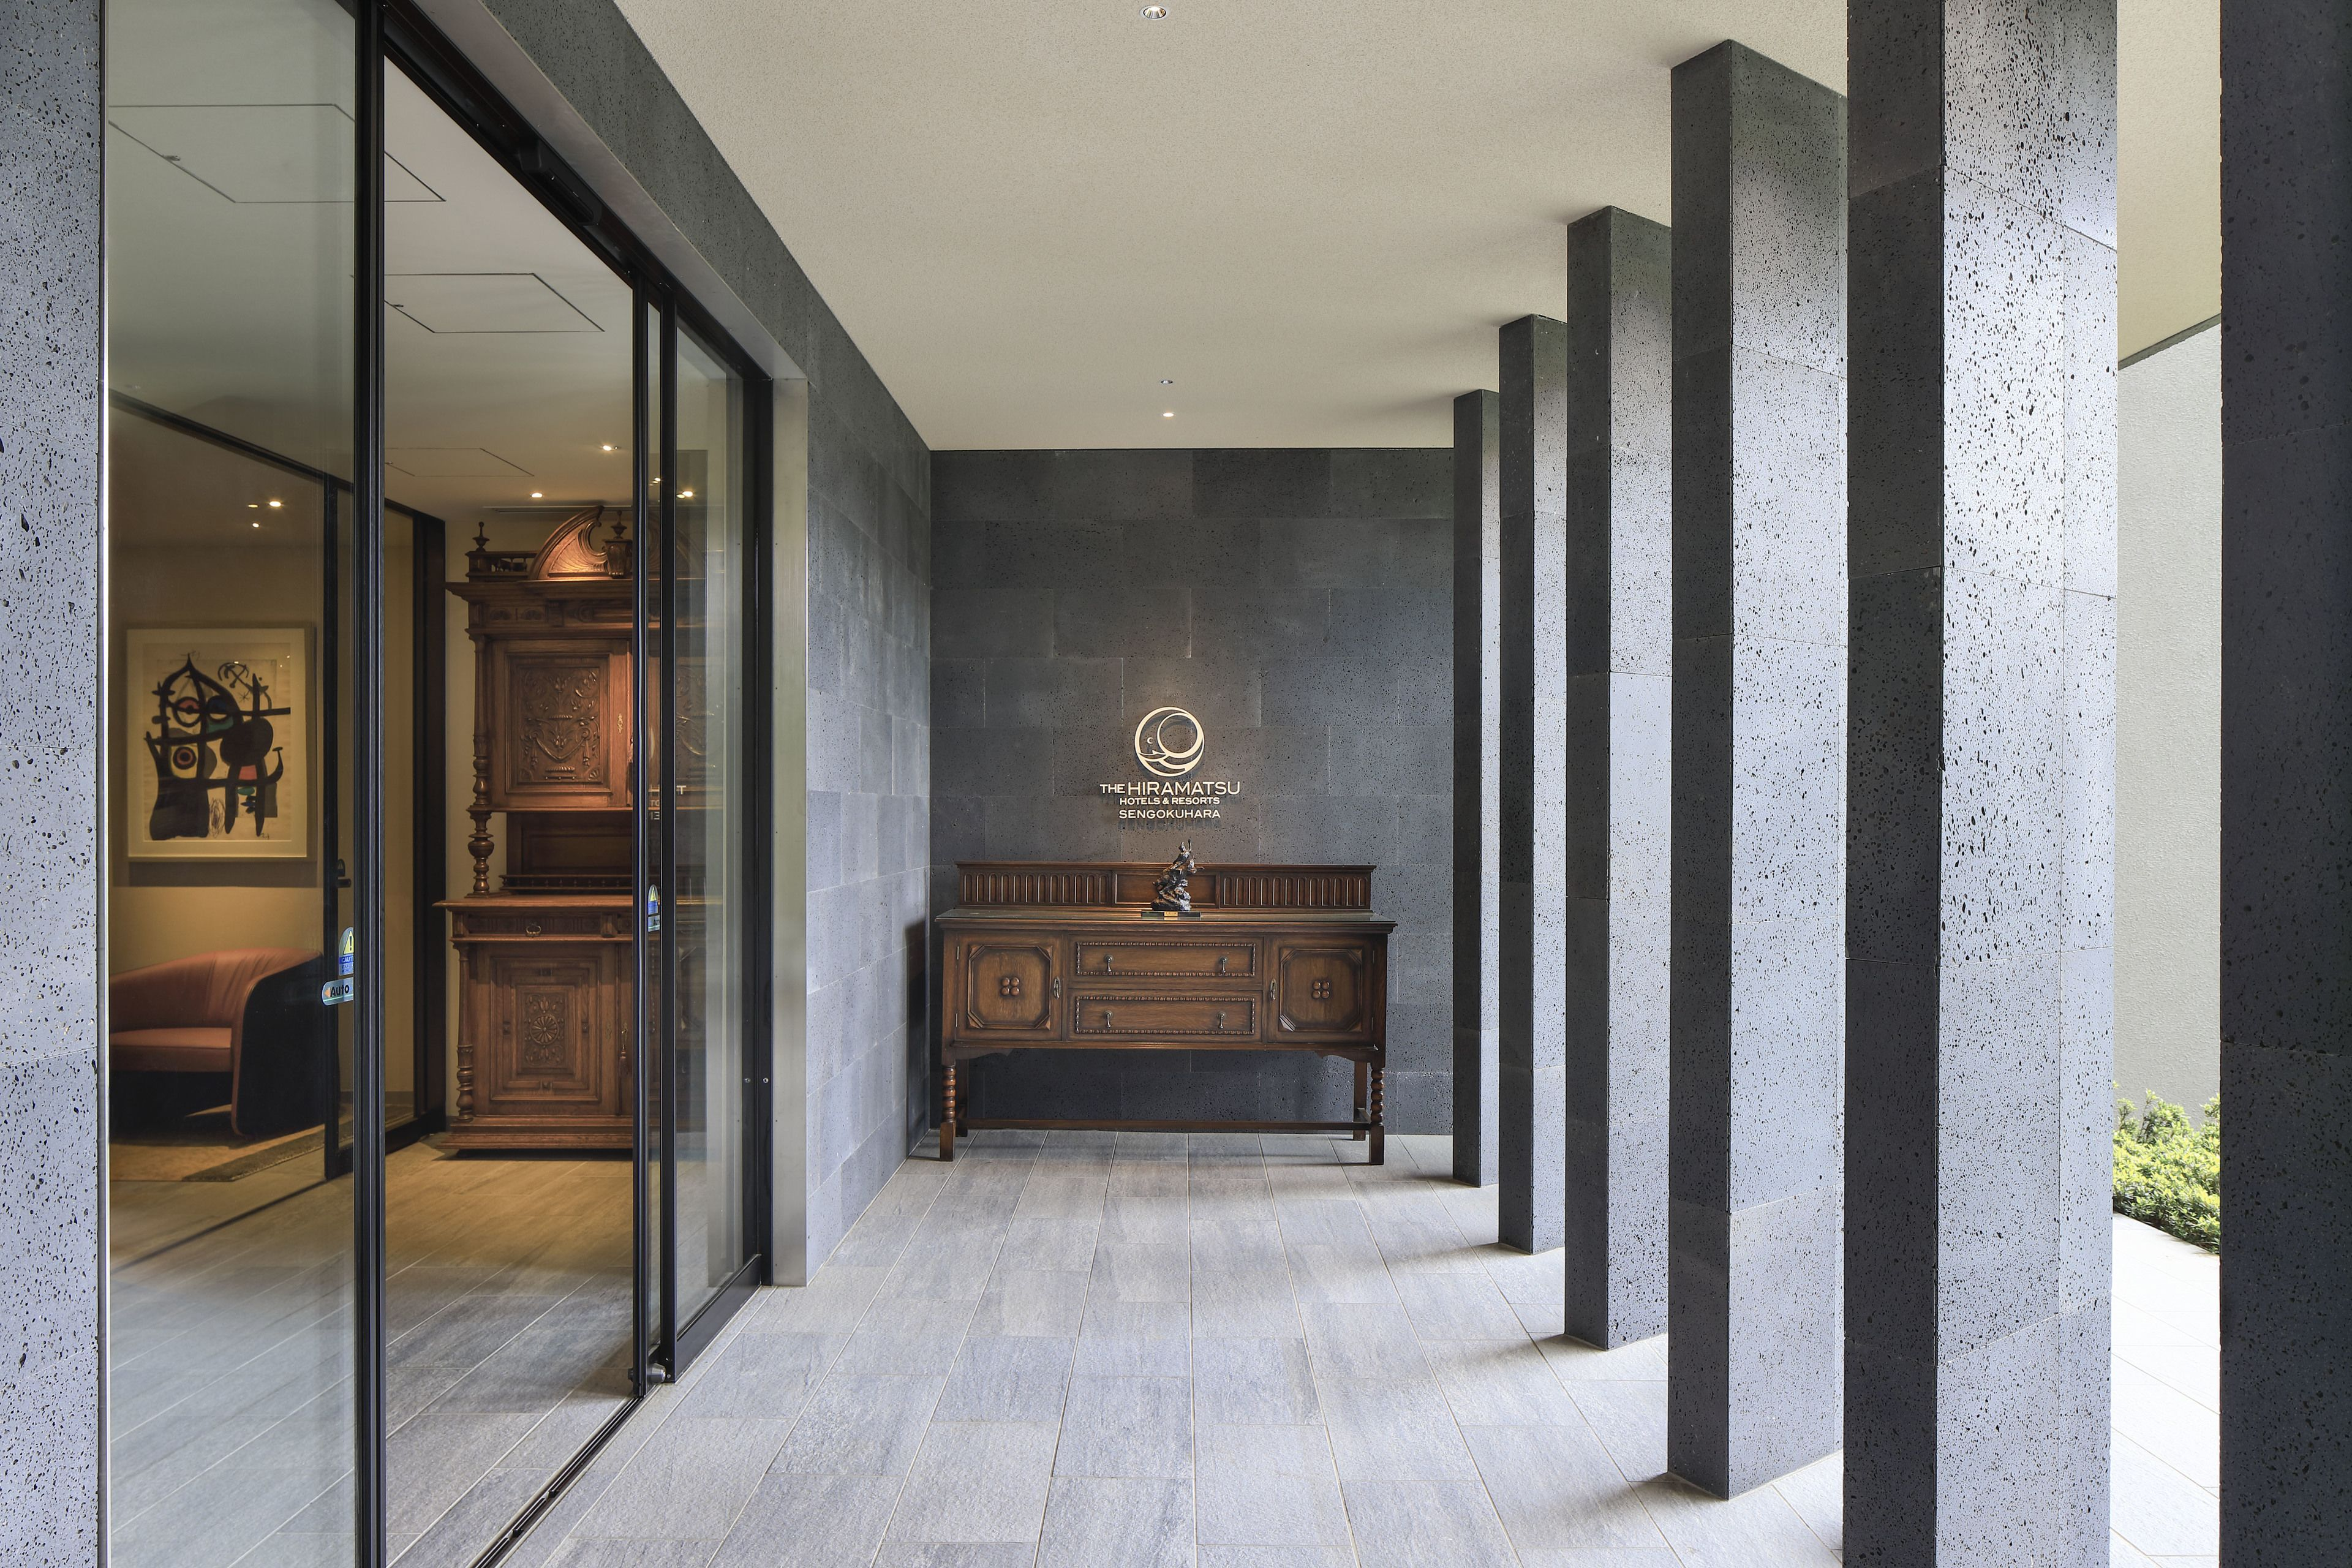 THE HIRAMATSU HOTELS & RESORTS SENGOKUHARA